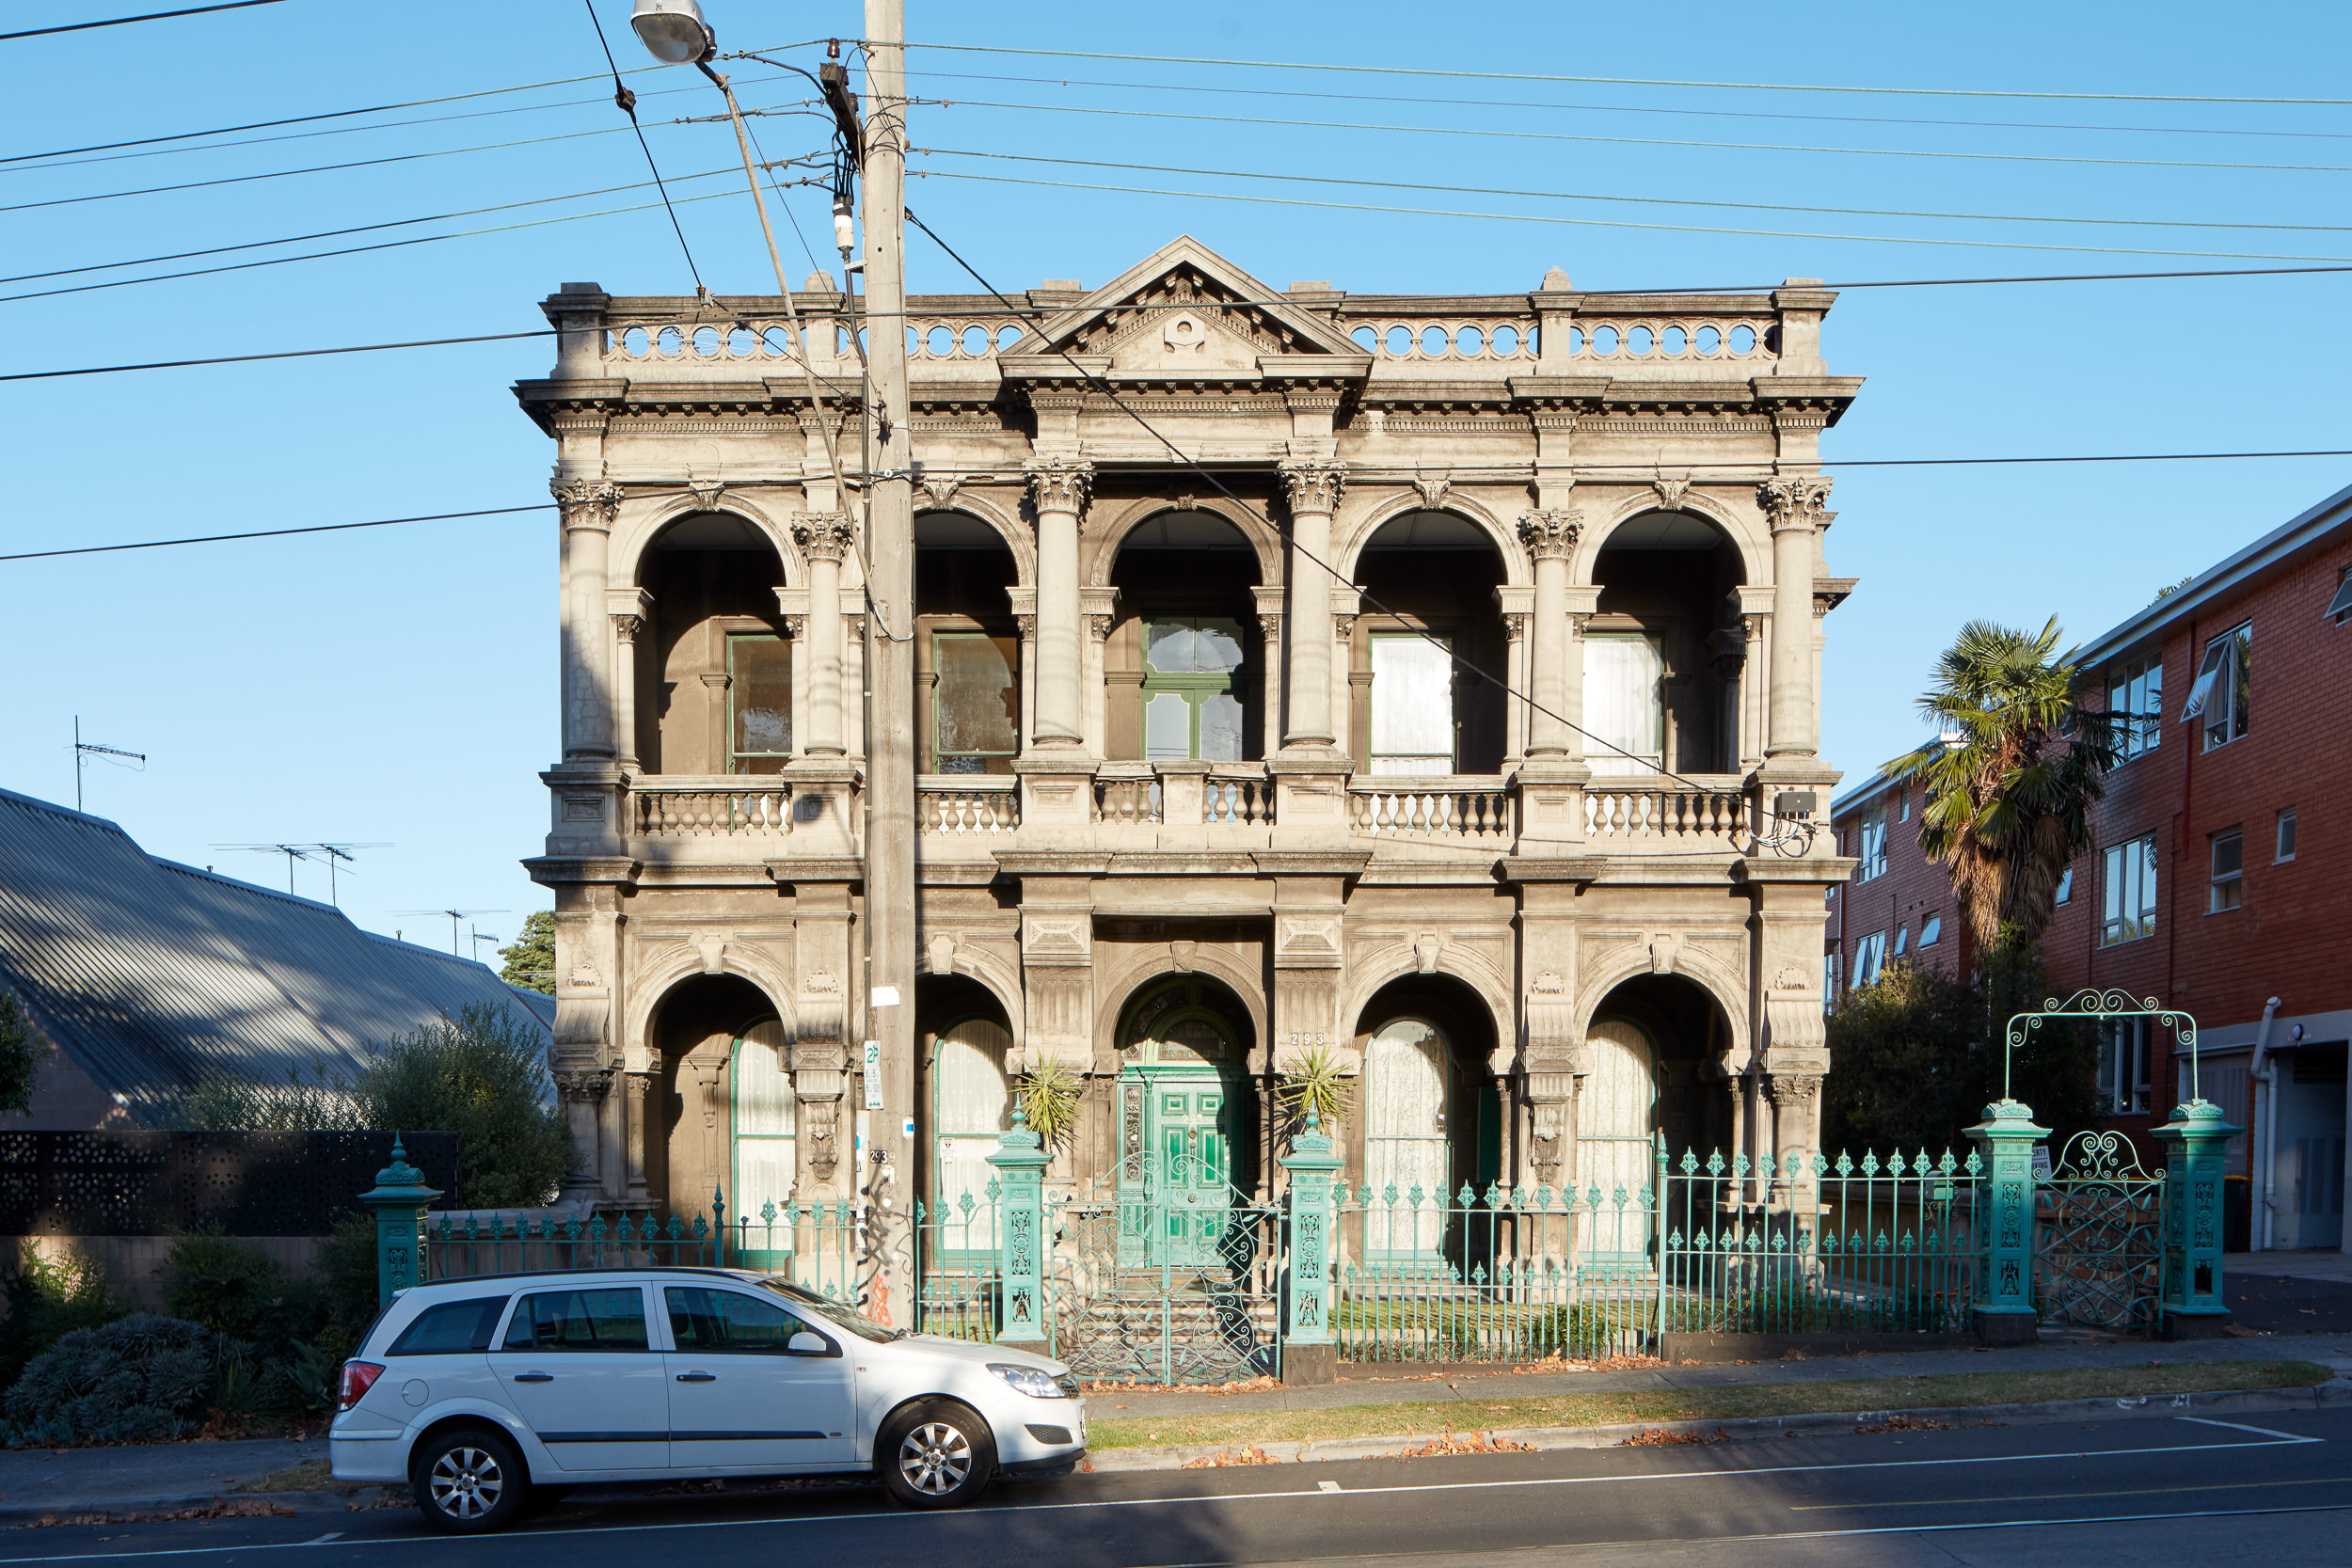 nathankdavis-nathan-k-davis-1nkd-architecture-architectural-photography-interior-exterior-design-real-estate-richmond-abinger-st-street-melbourne-1